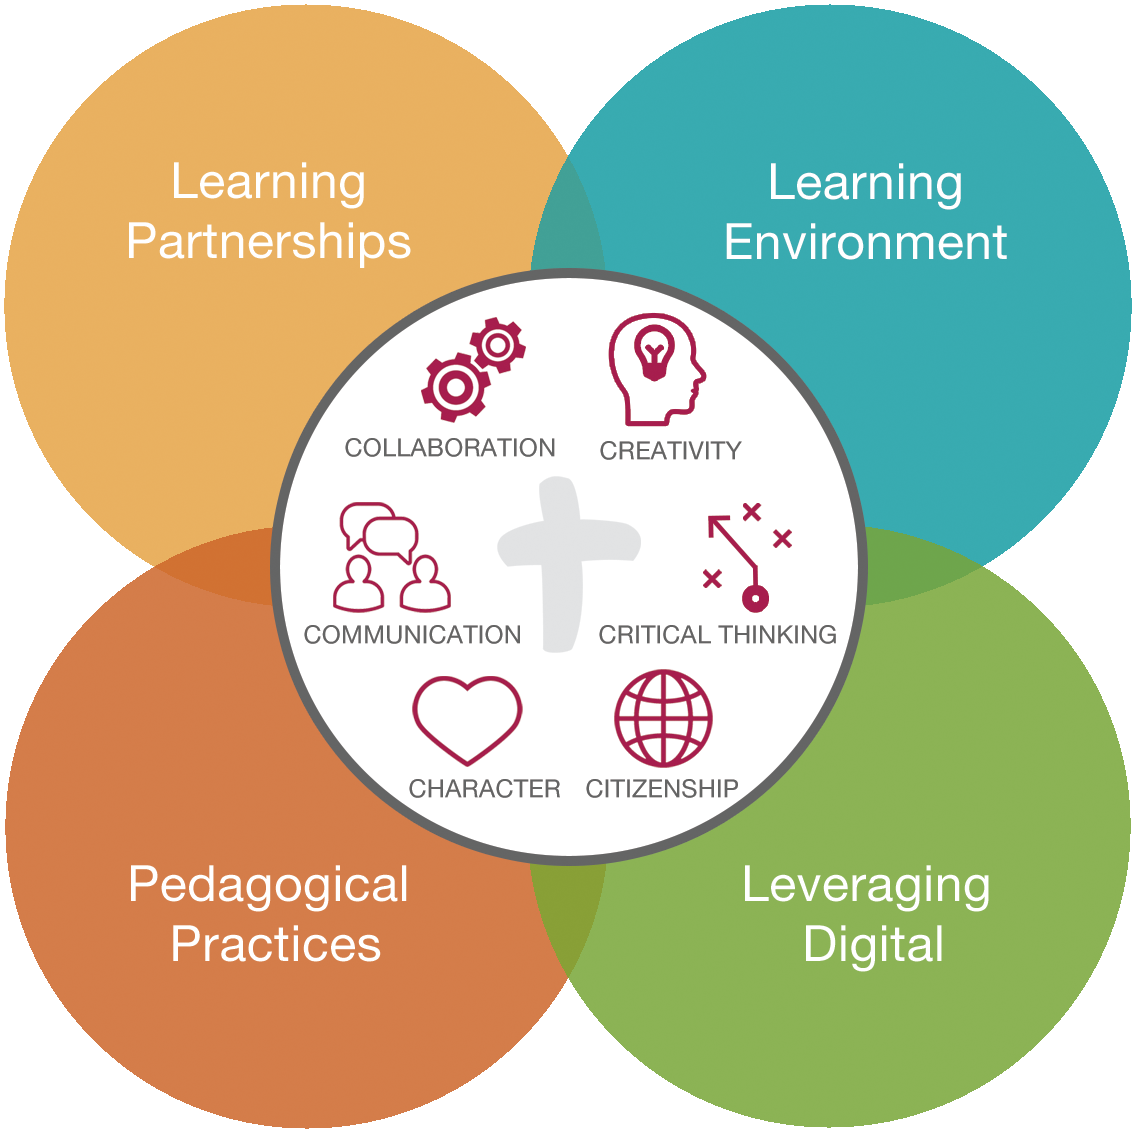 Deep Learning in OCSB schools - OCSB